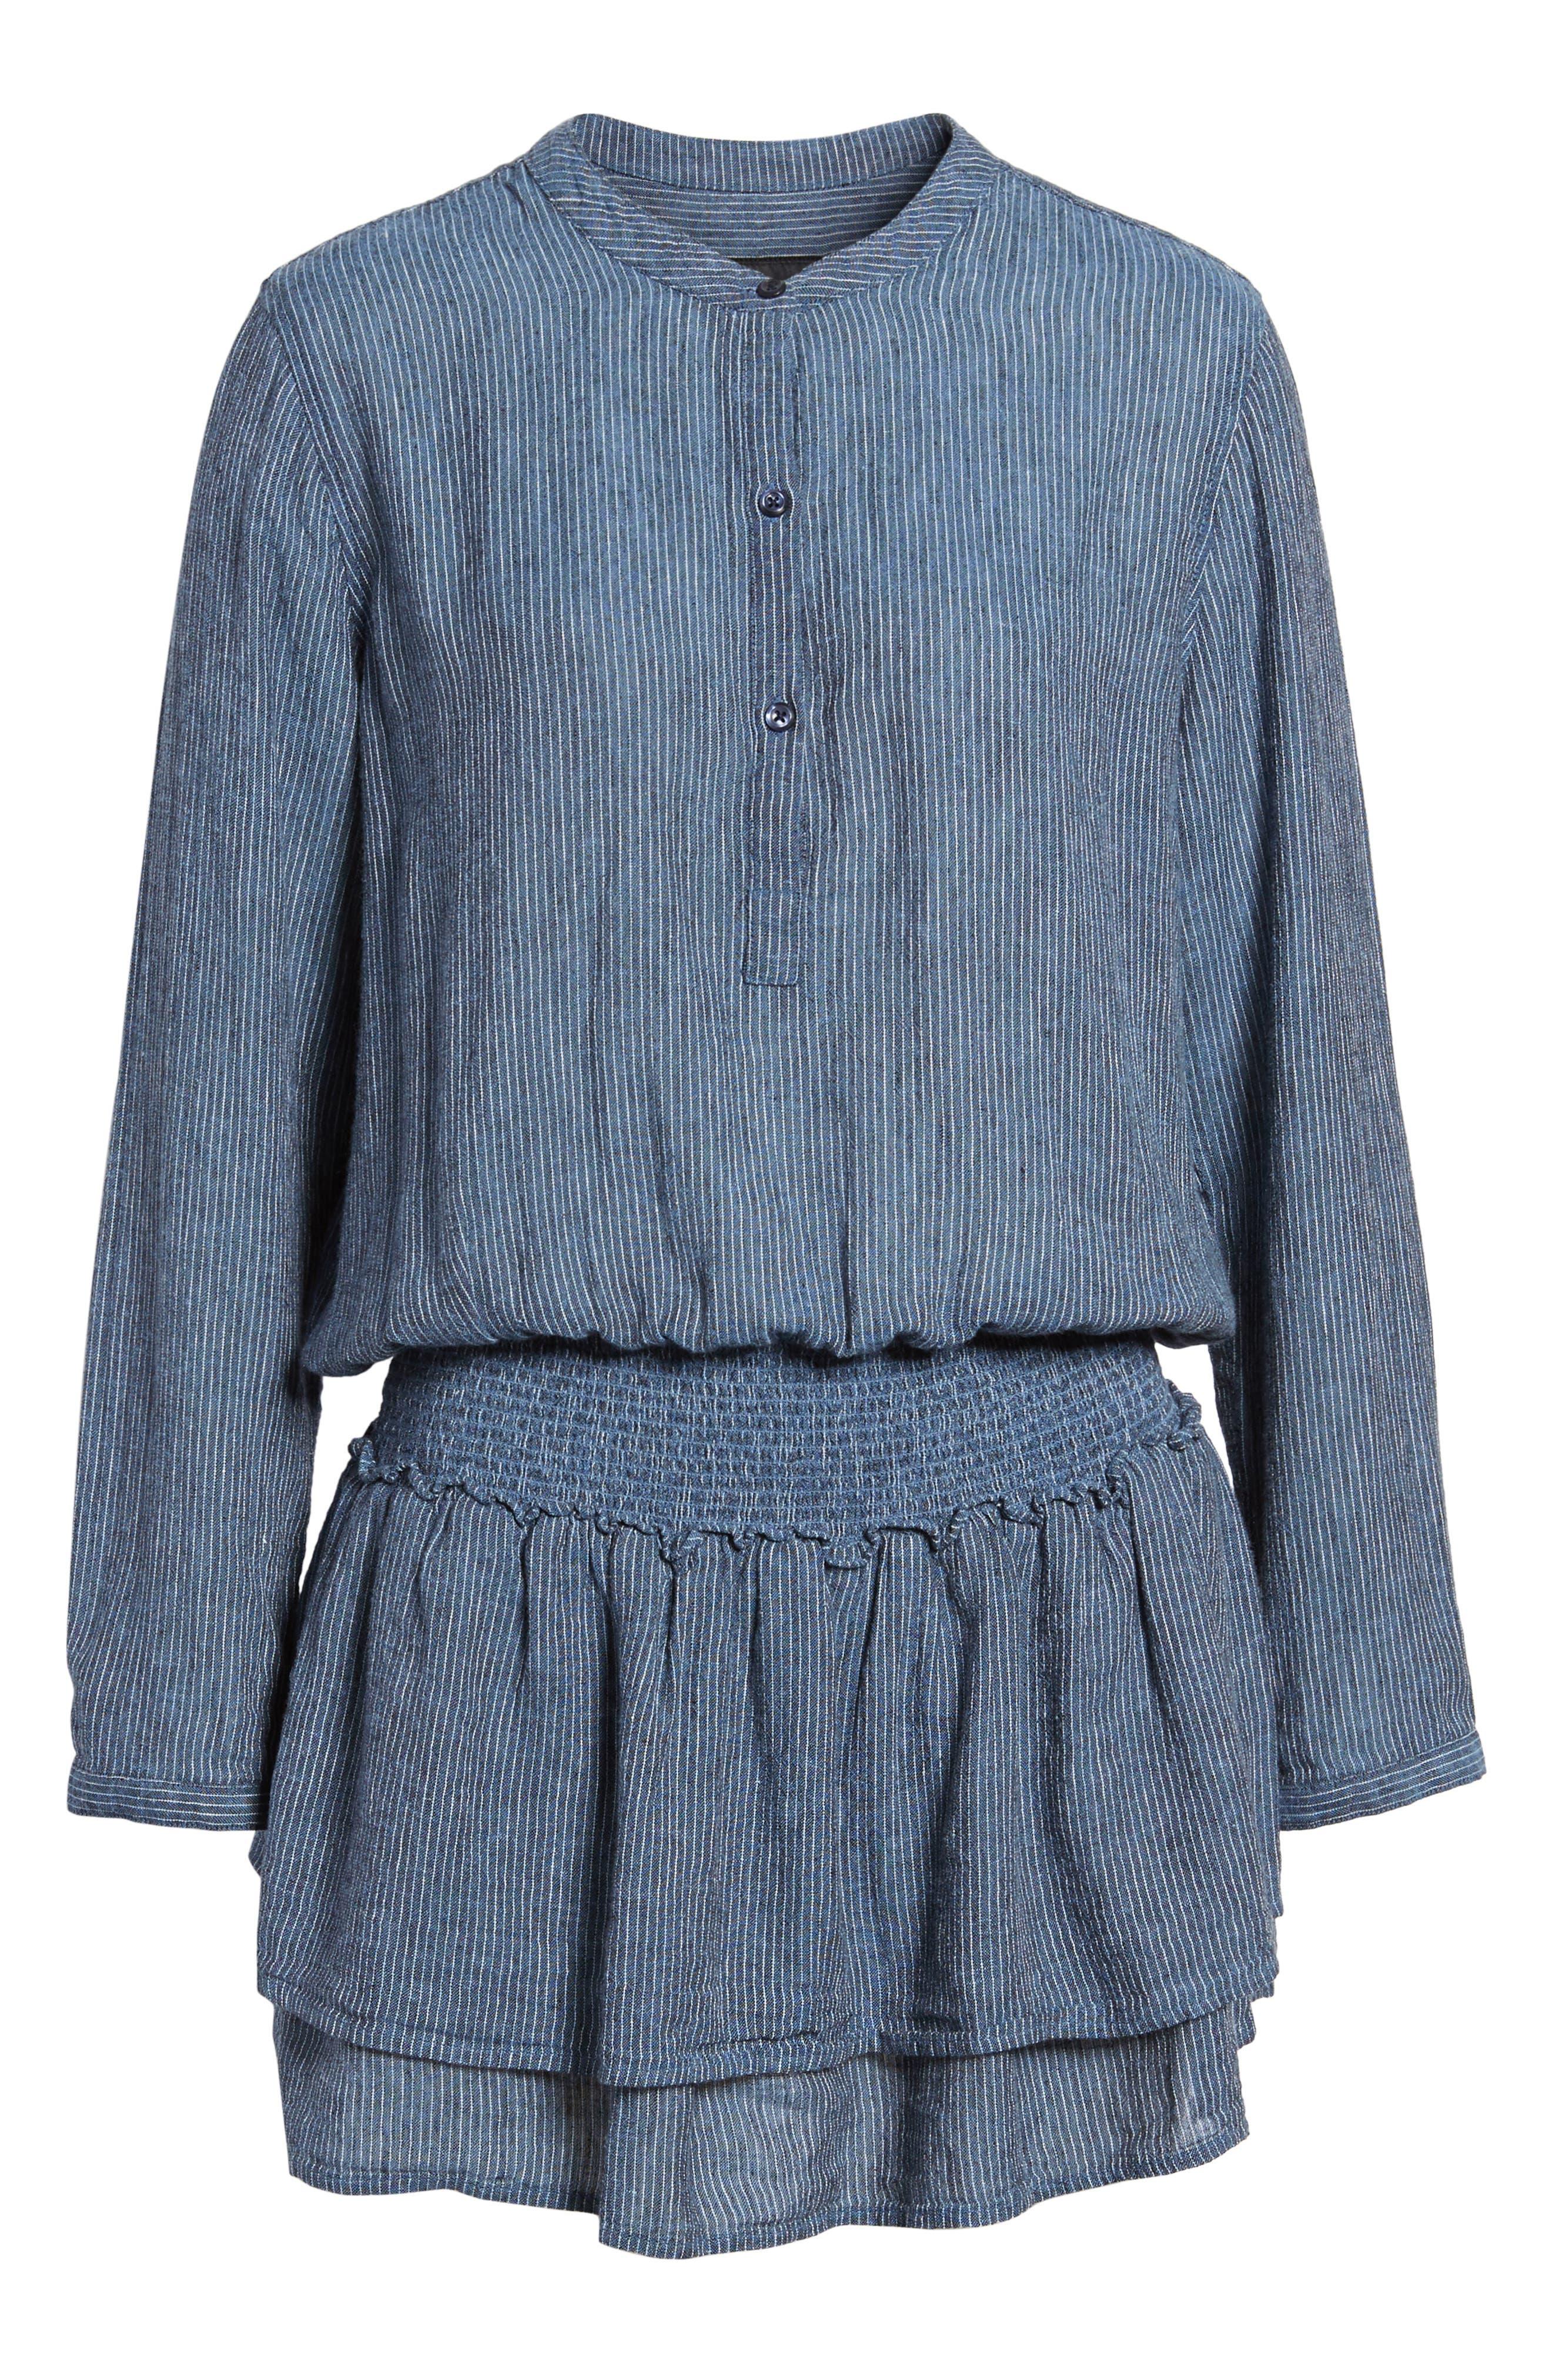 Juliette Linen Blend Dress,                             Alternate thumbnail 6, color,                             400